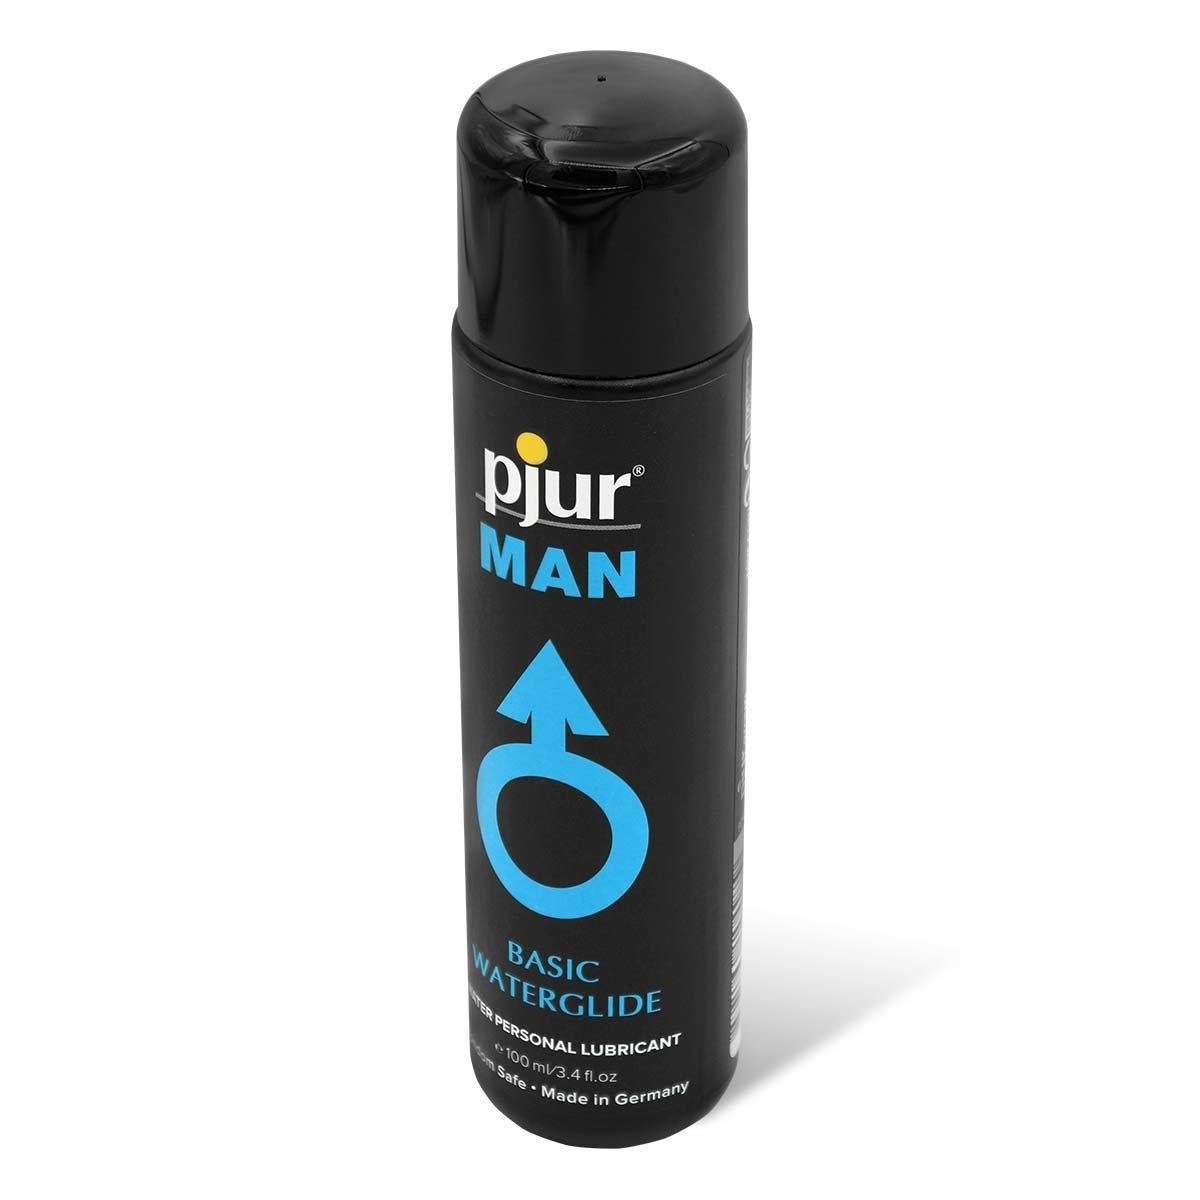 pjur MAN BASIC 100ml 水性潤滑液